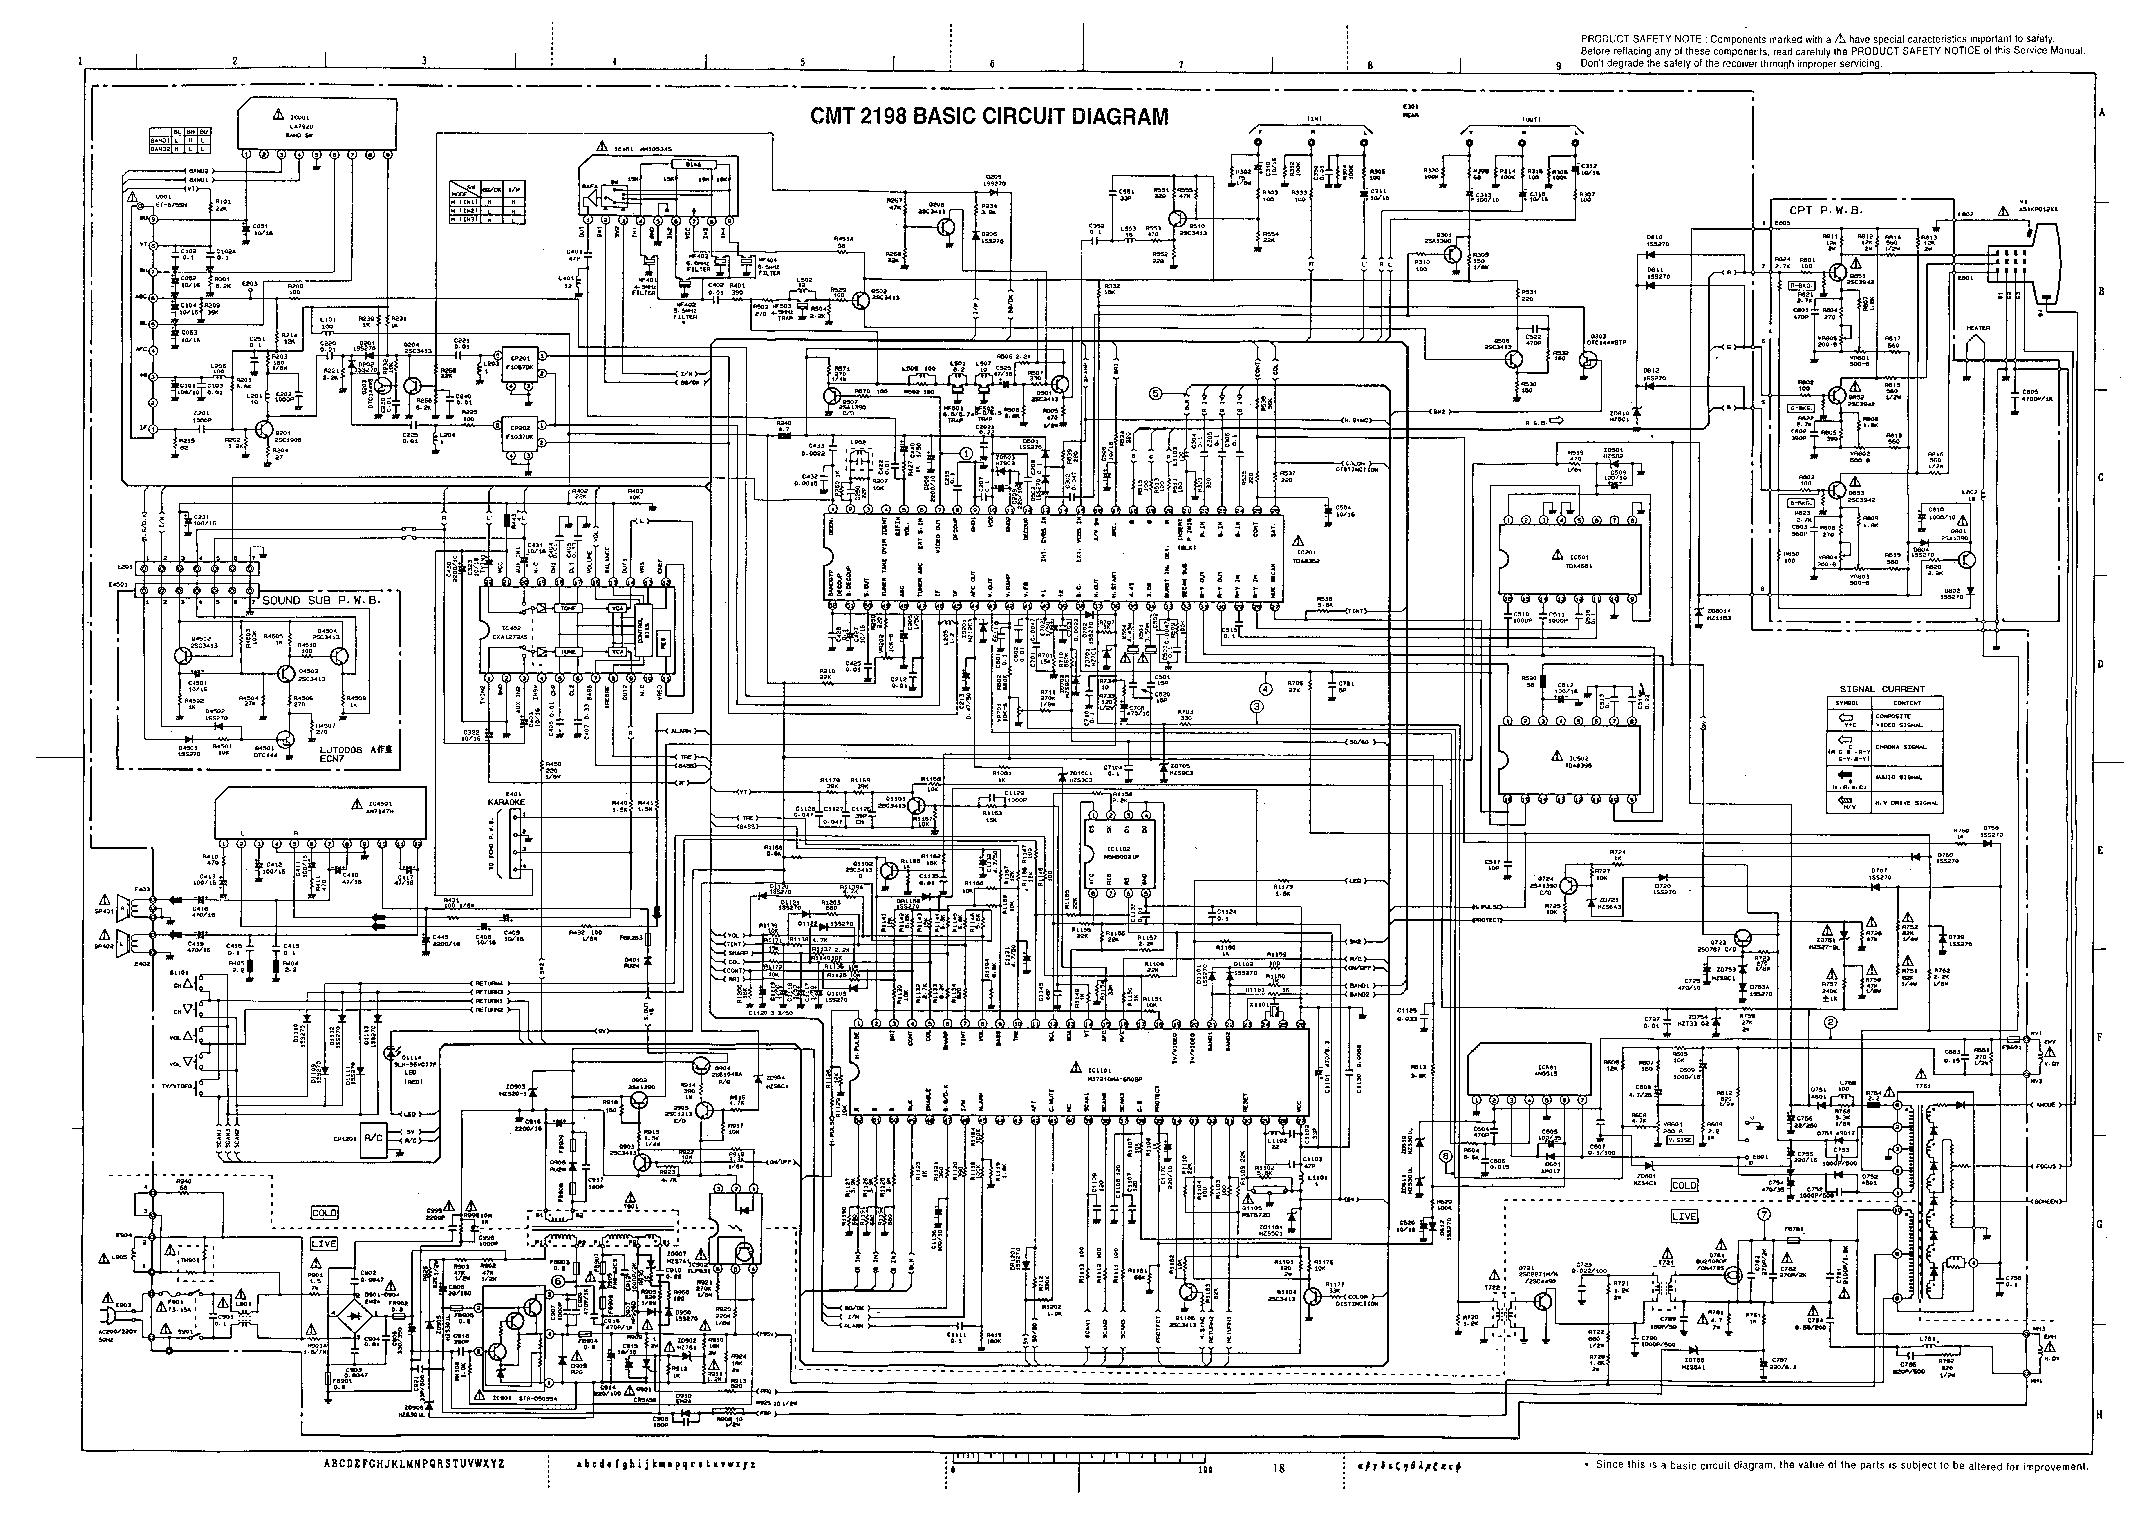 Hitachi Schematic Diagram Electrical Wiring Diagrams Circuit Tv For Light Switch U2022 Ex 2500 Hydraulic